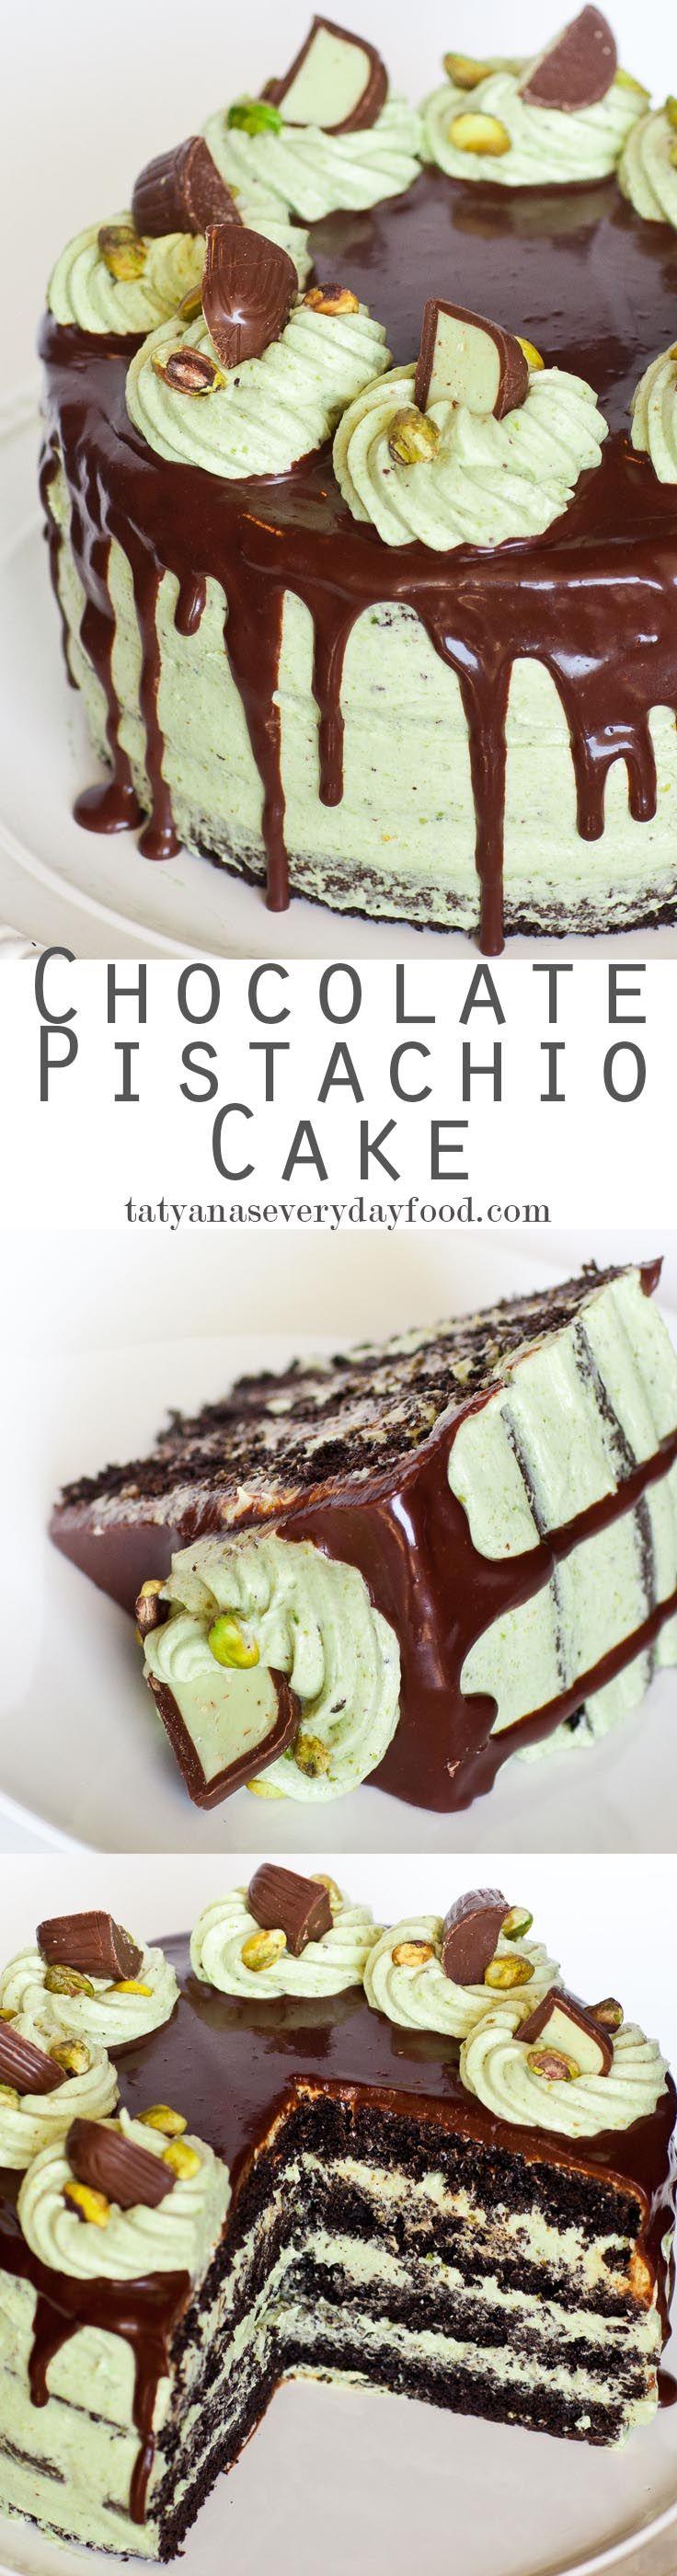 Chocolate Pistachio Cake With Irish Cream - Tatyanas Everyday Food